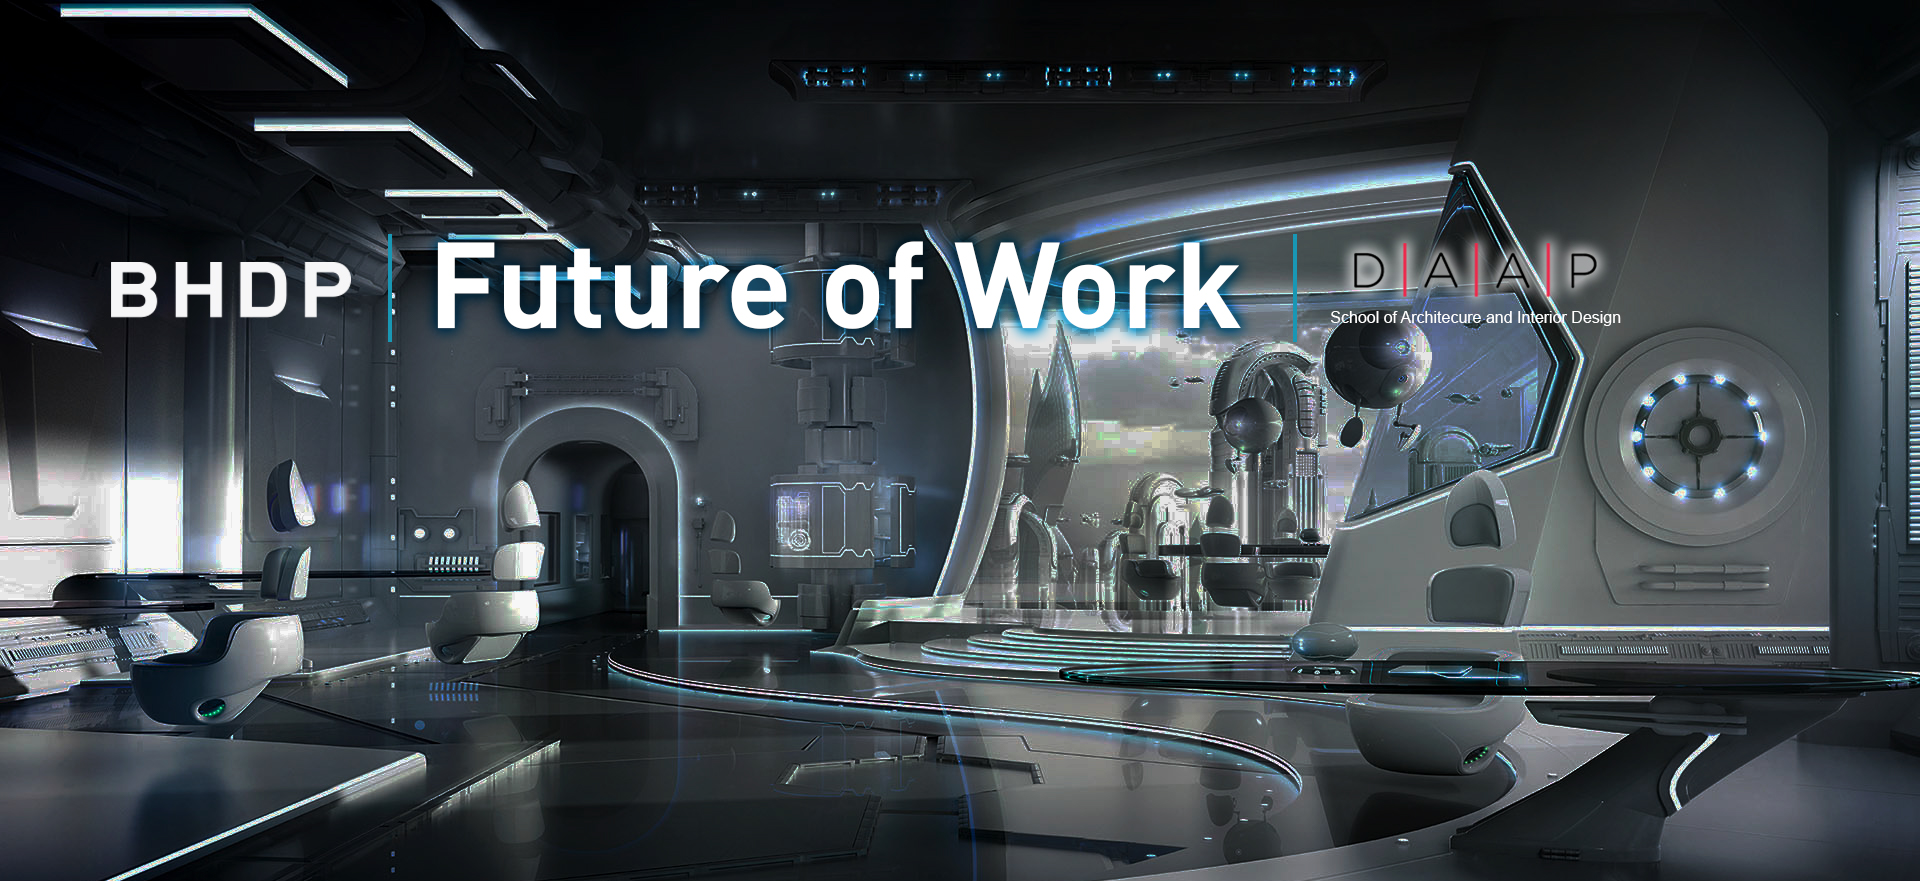 BHDP Future of Work